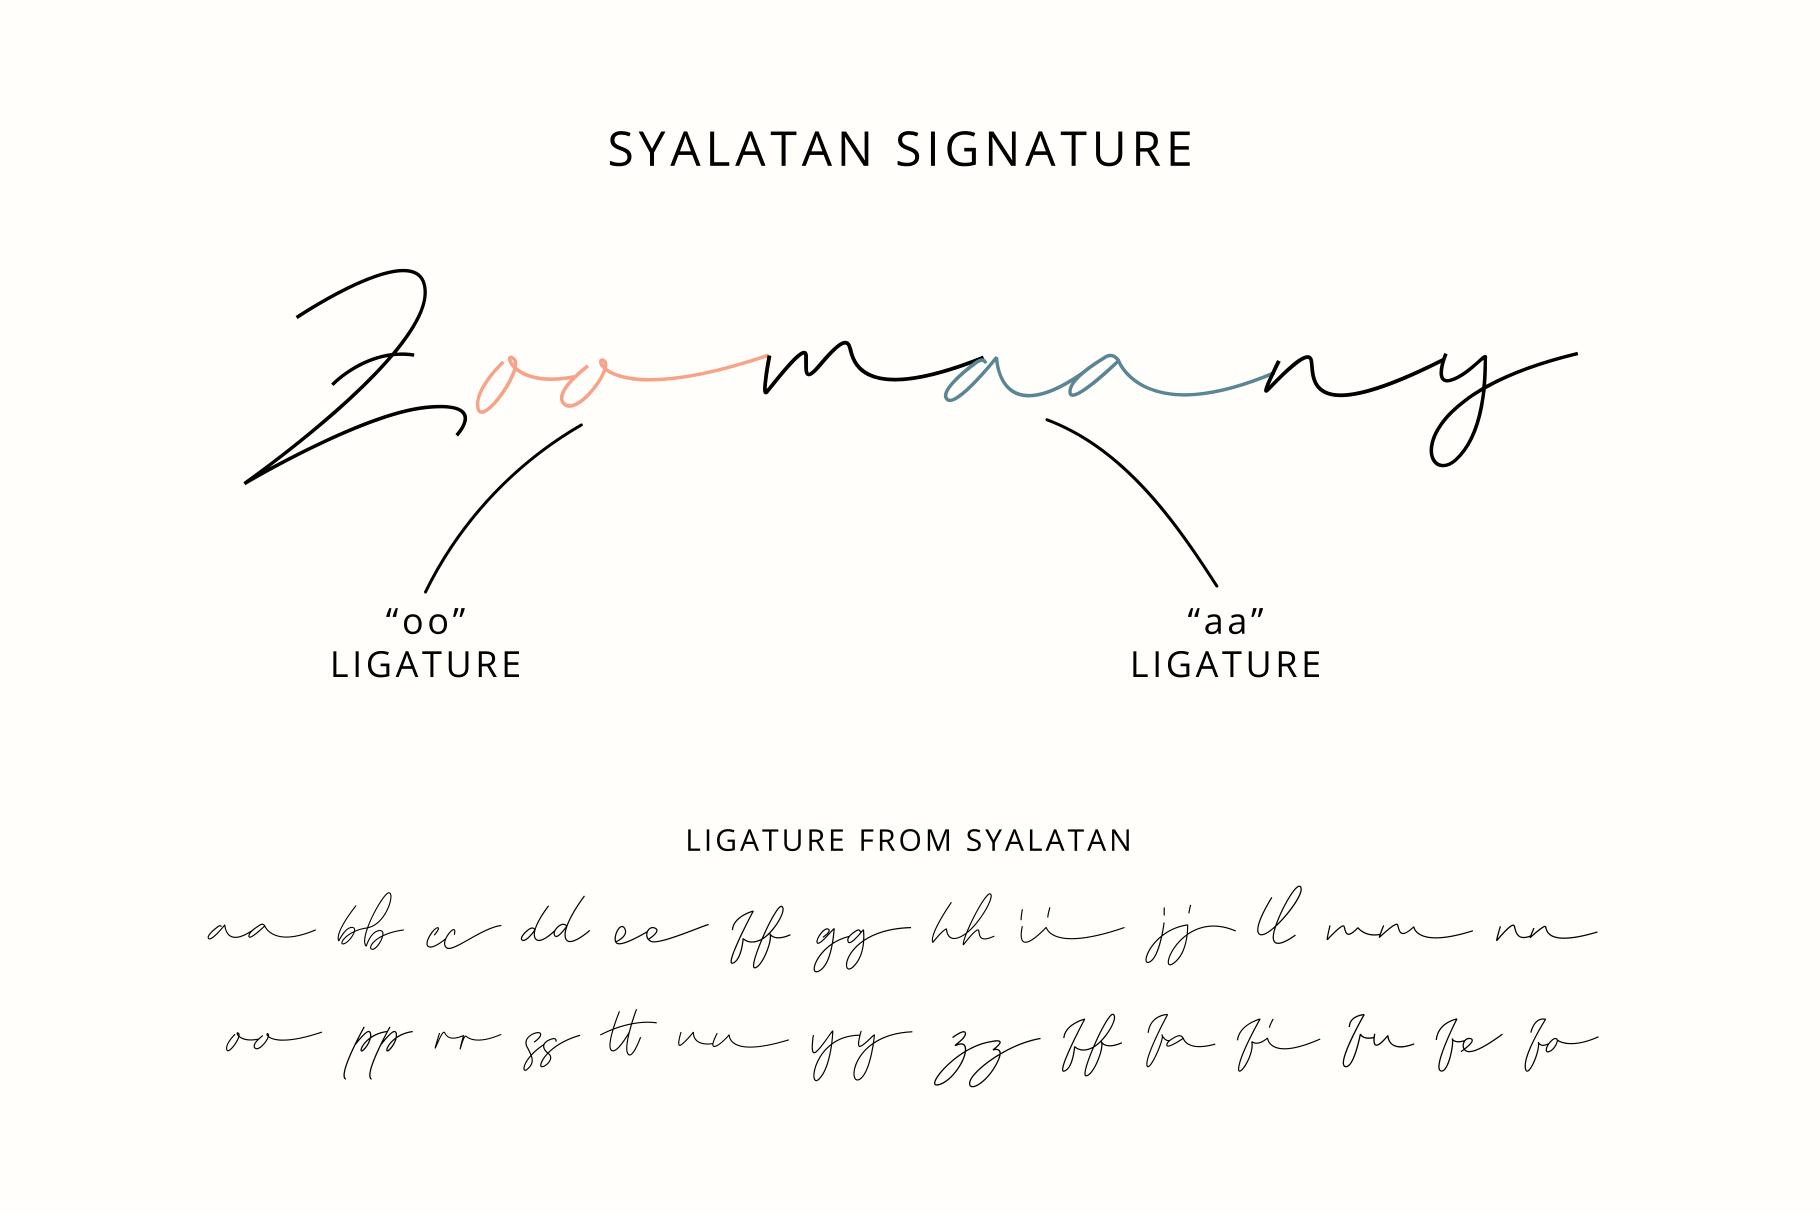 Syalatan - The Handwritten Signature example image 3